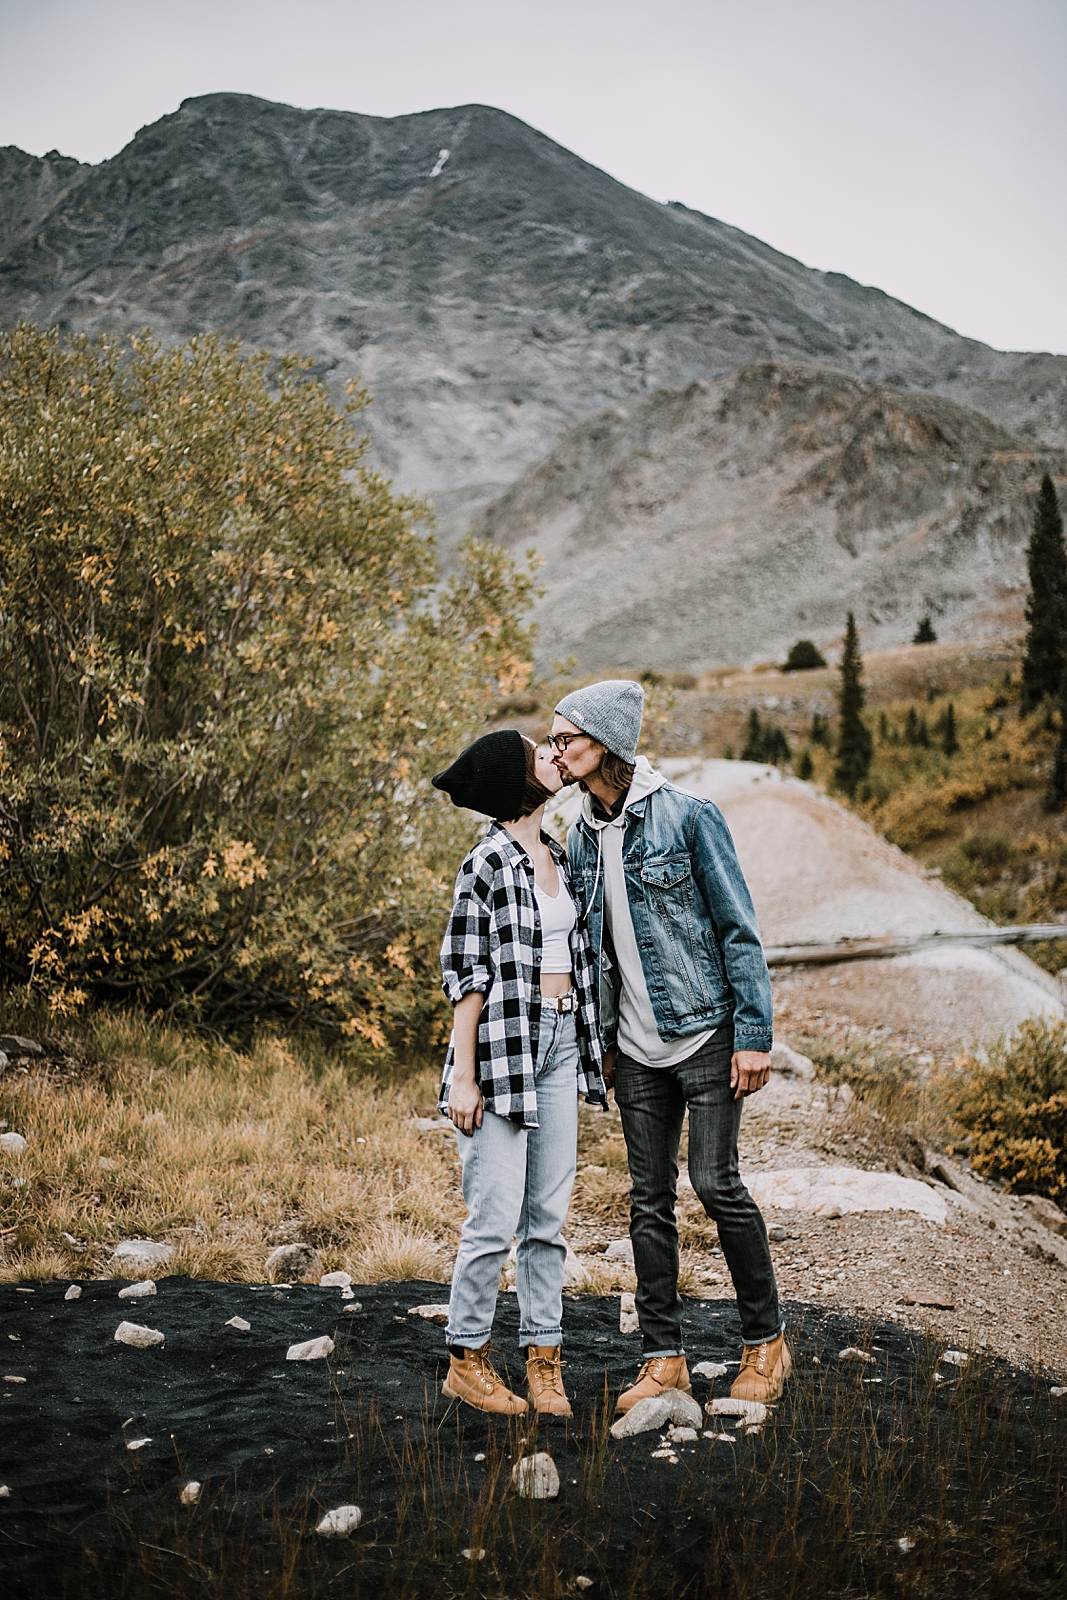 couple kissing, colorado mining, hike mayflower gulch, mayflower gulch proposal, mayflower gulch elopement, mayflower gulch wedding, mayflower gulch engagments, leadville elopement, leadville wedding